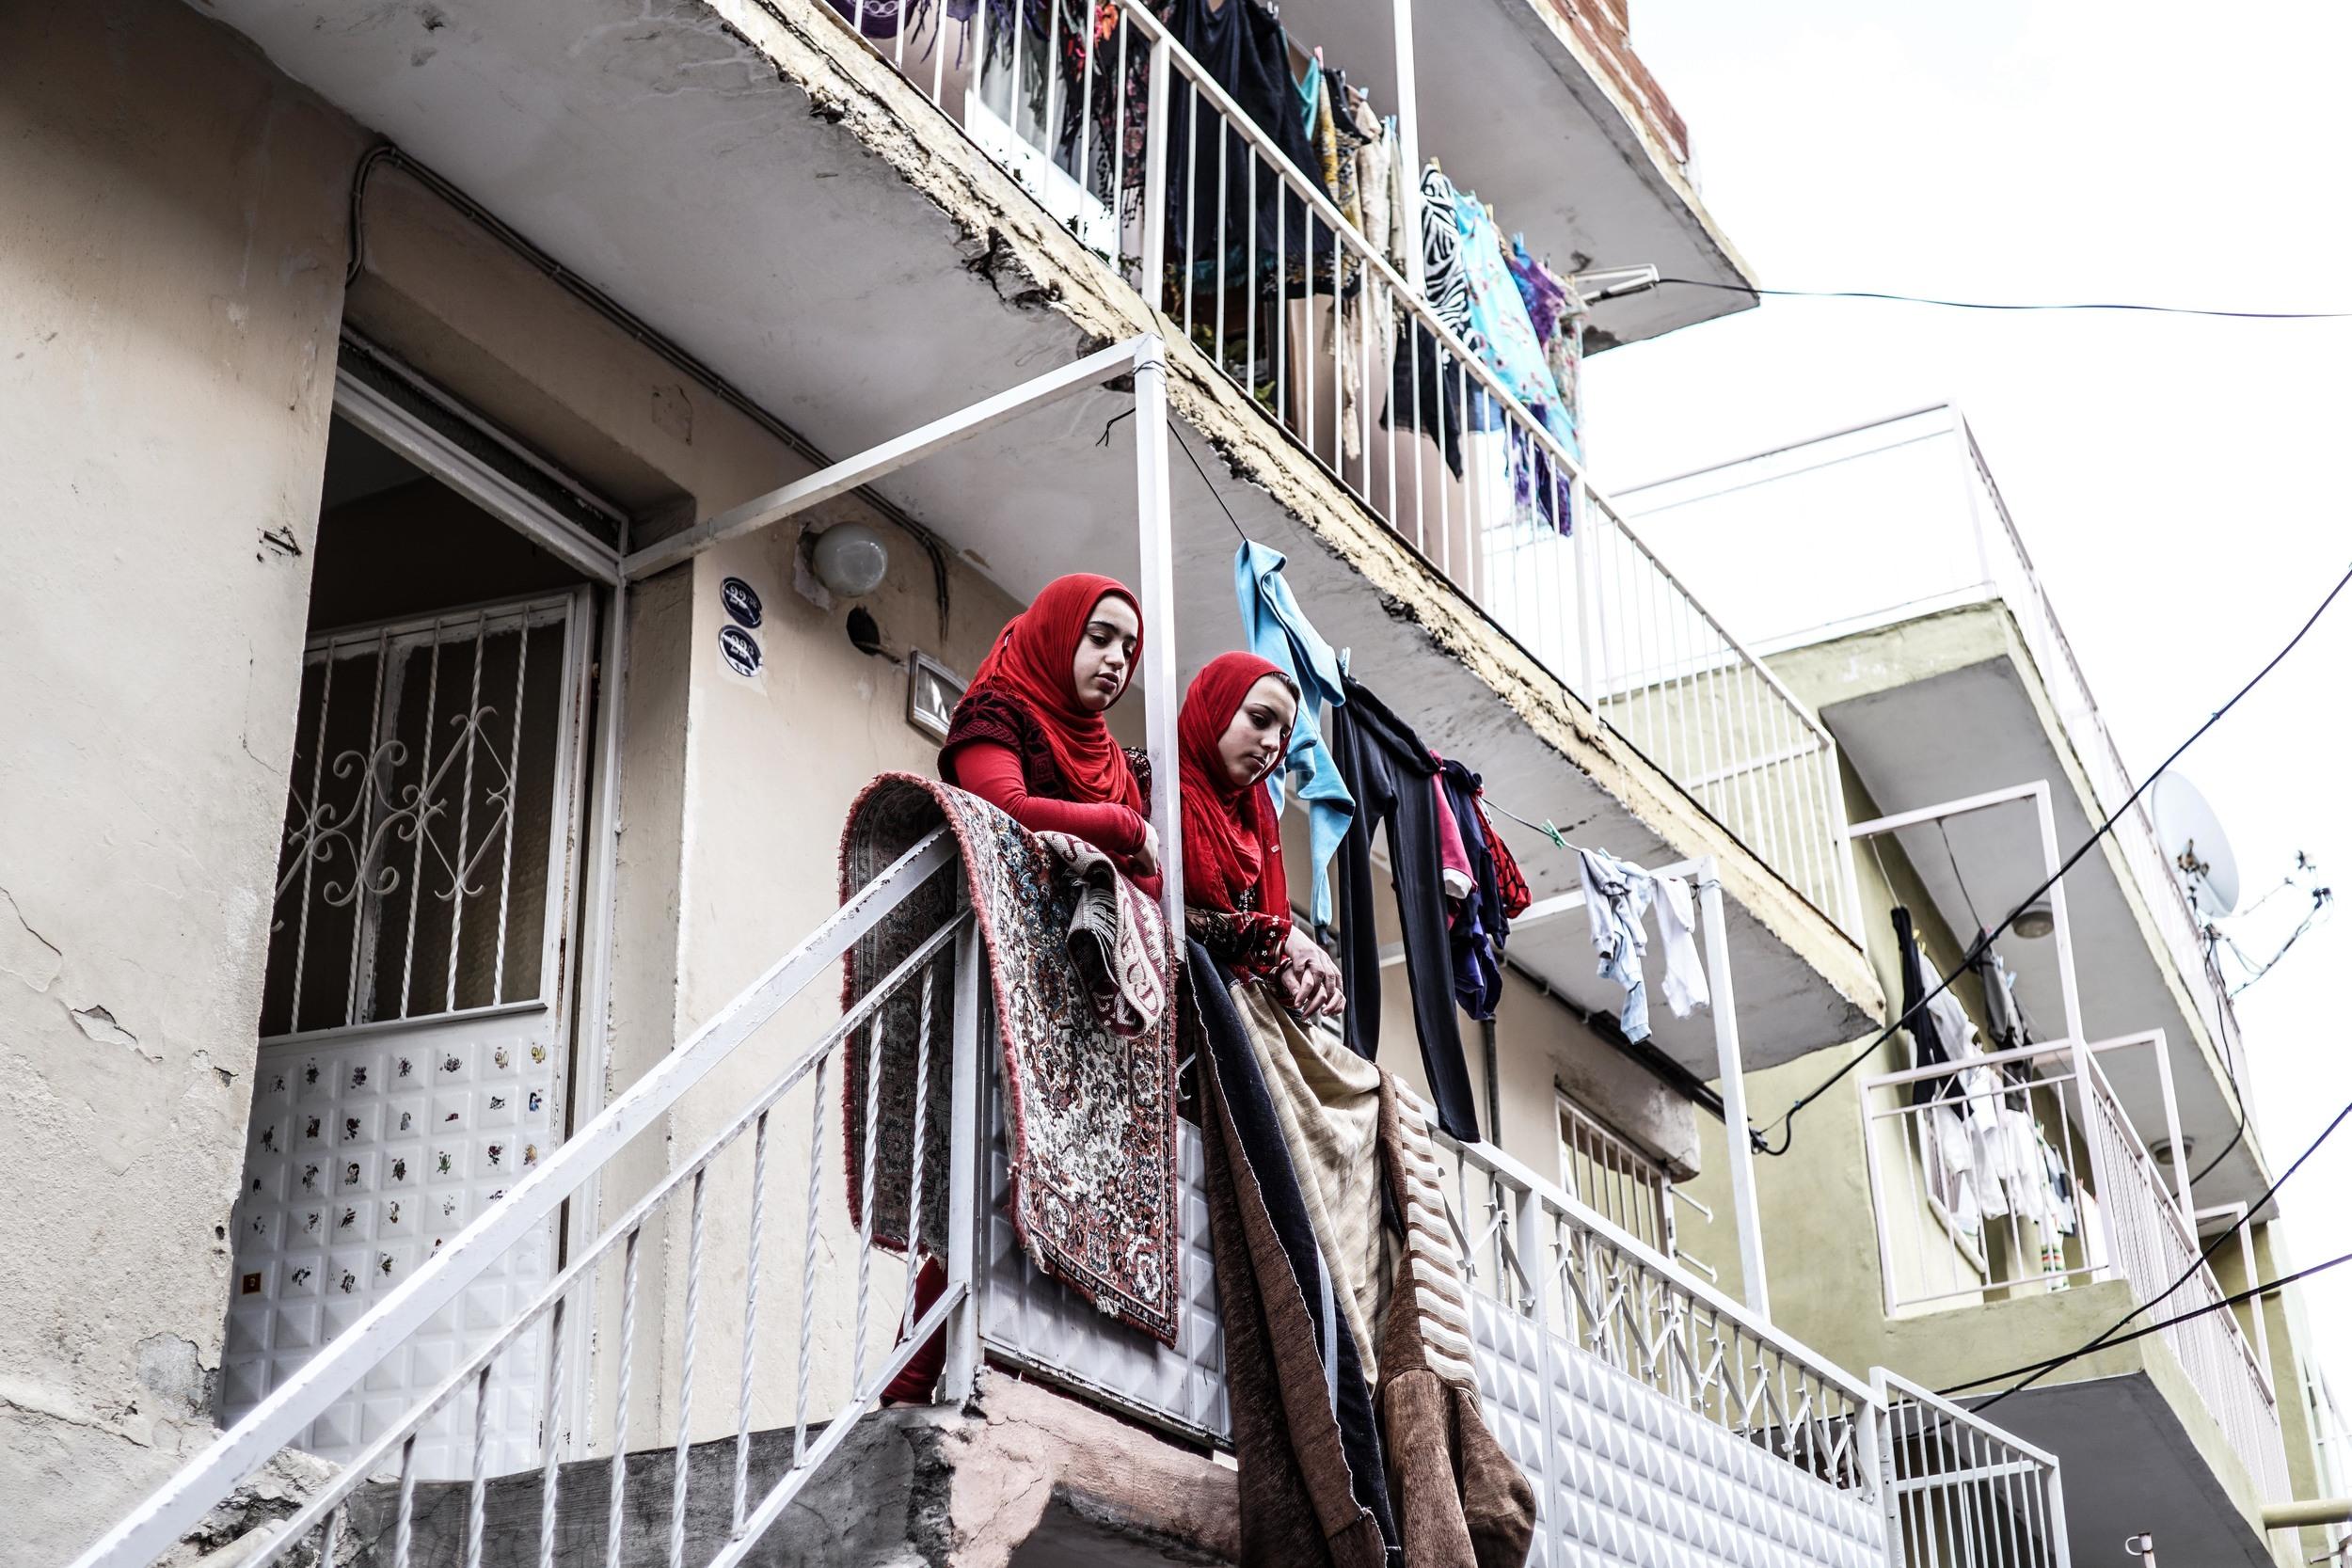 Syrian Refugee Crisis Izmir November 2015 7.jpg